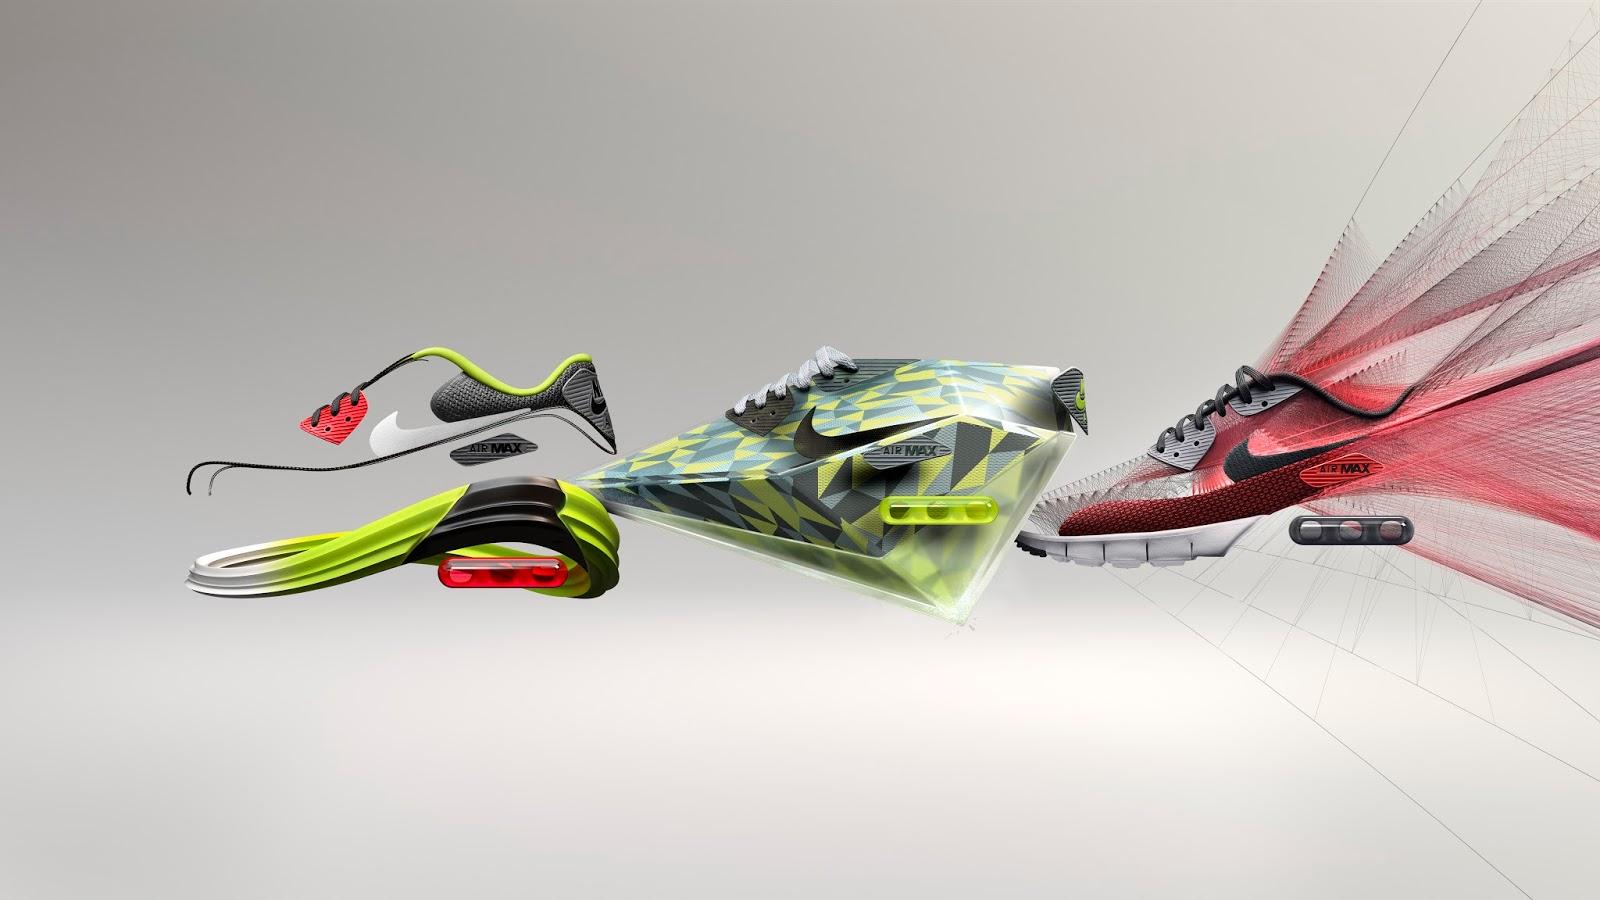 Nike Air Max Lunar90, Air Max 90 Jacquard and Air Max 90 Ice-Debut Jan 2014